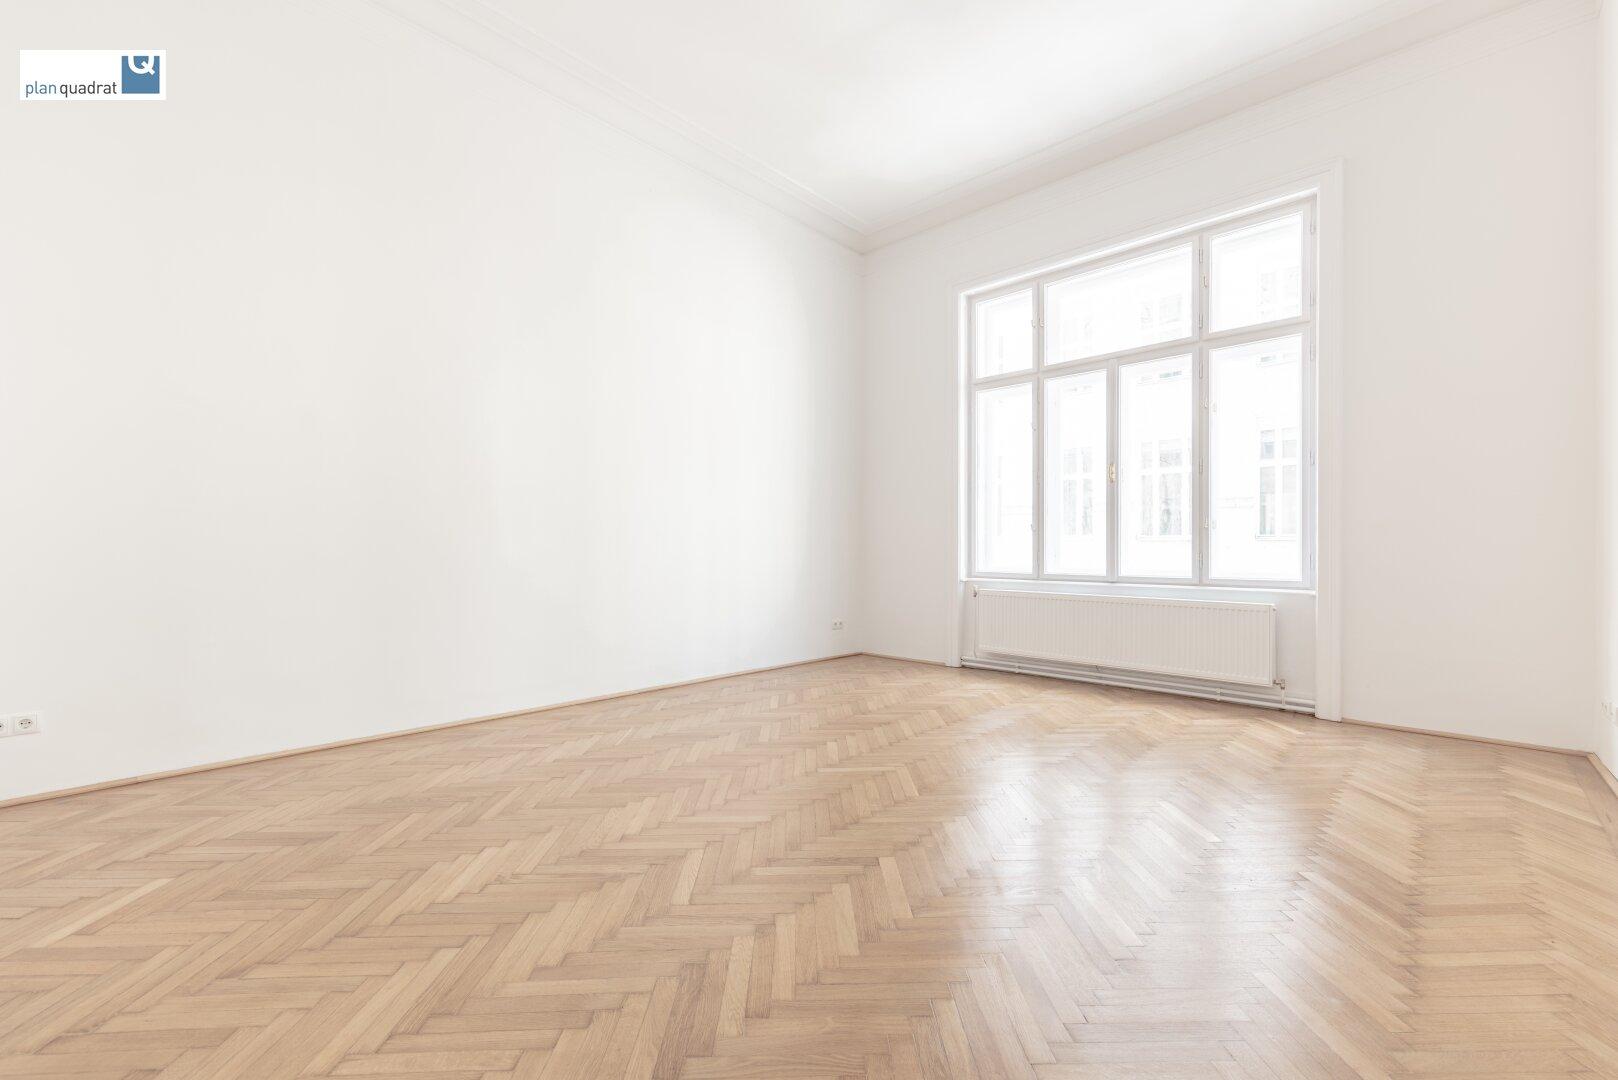 Raum 2 (gem. Grunsrissskizze - ca. 5,20 qm)